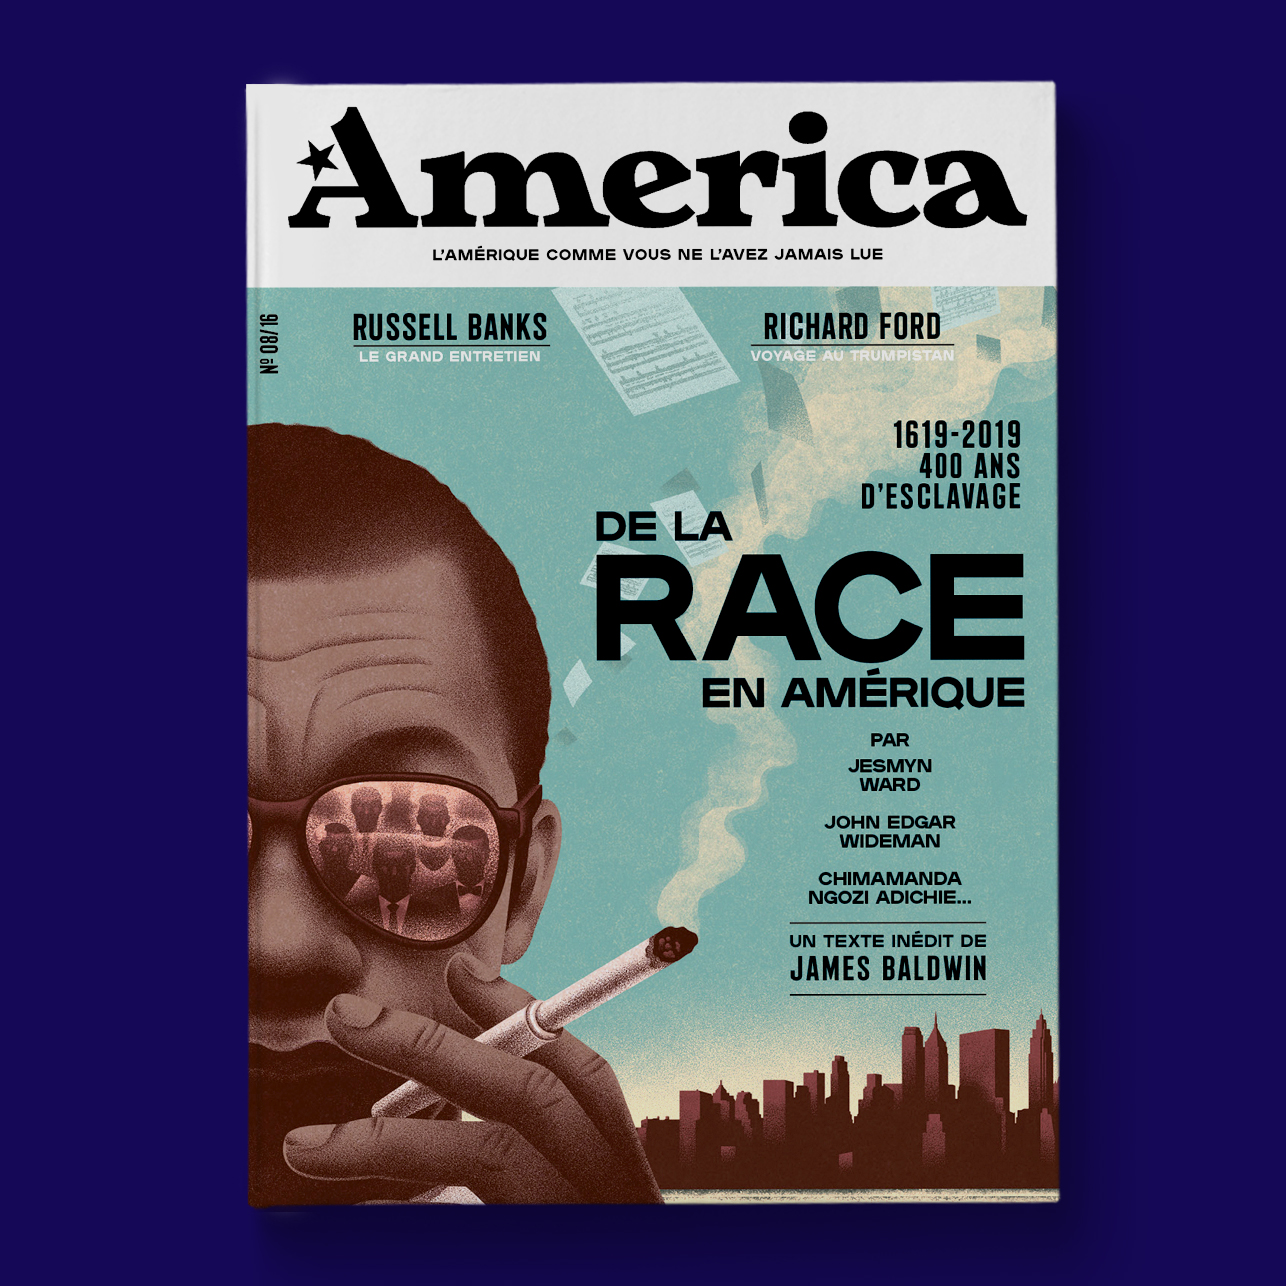 AMERICA_COVER8.jpg